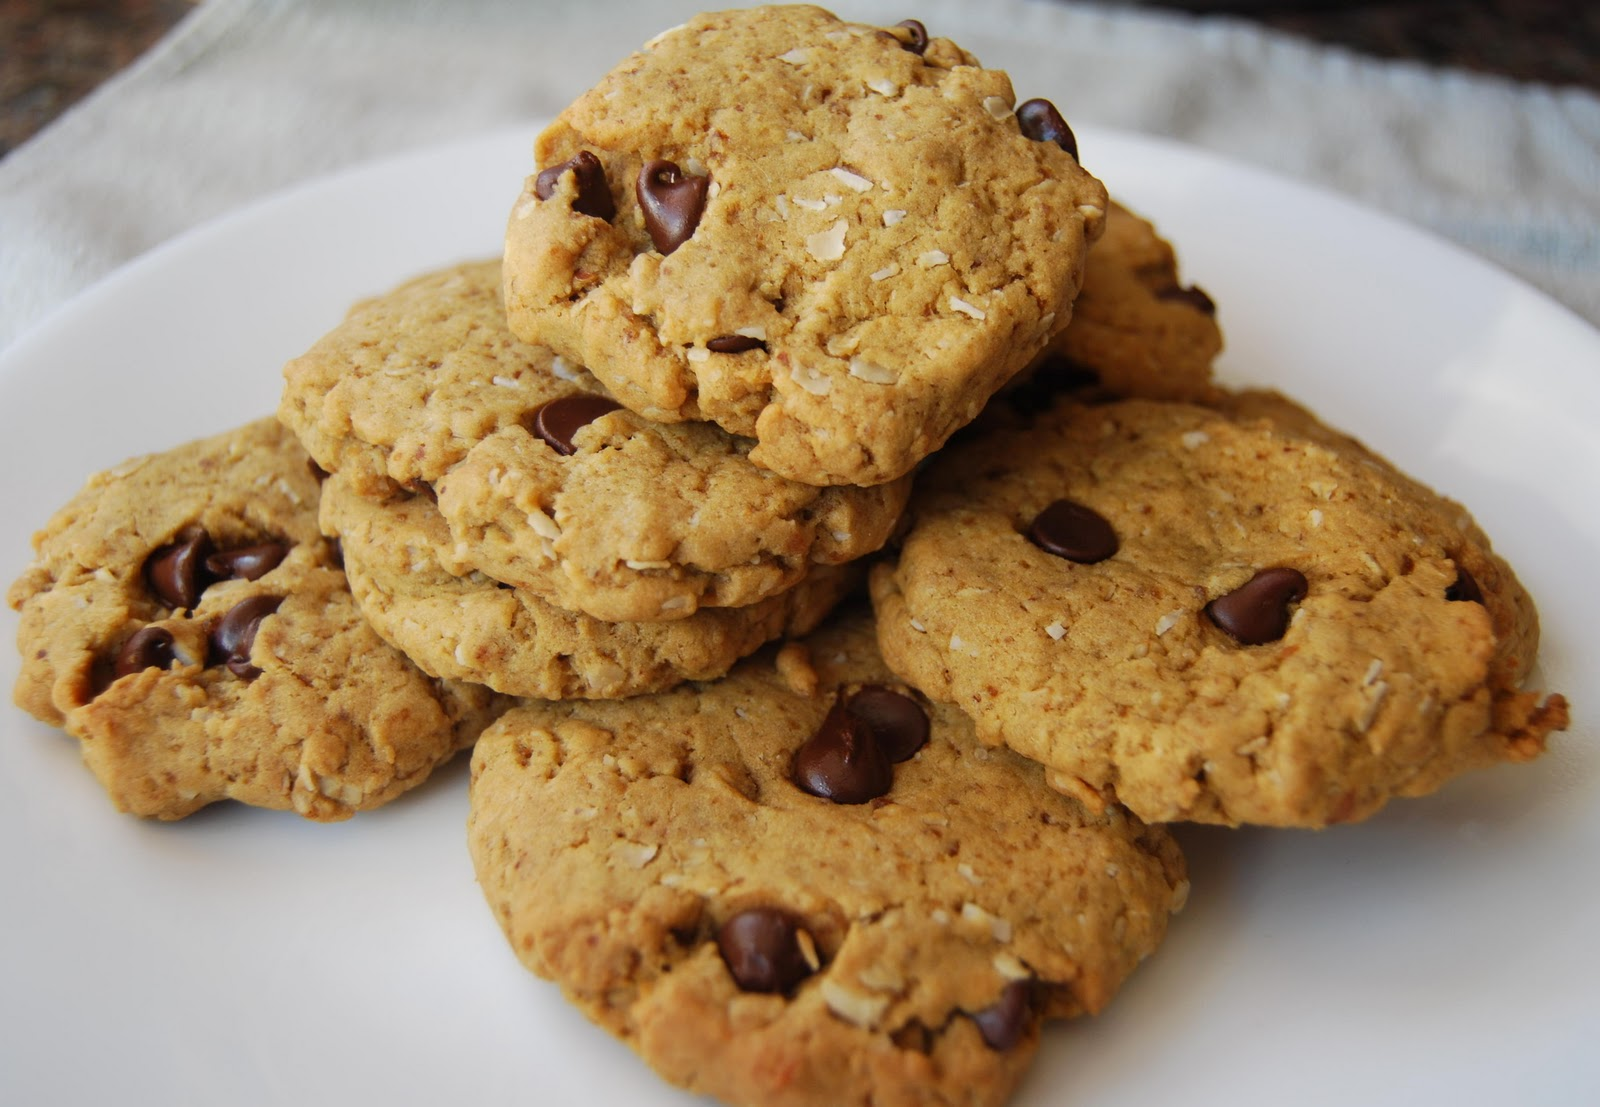 ... Kitchen: of vegan creations: Chocolate chip coconut oat cookies